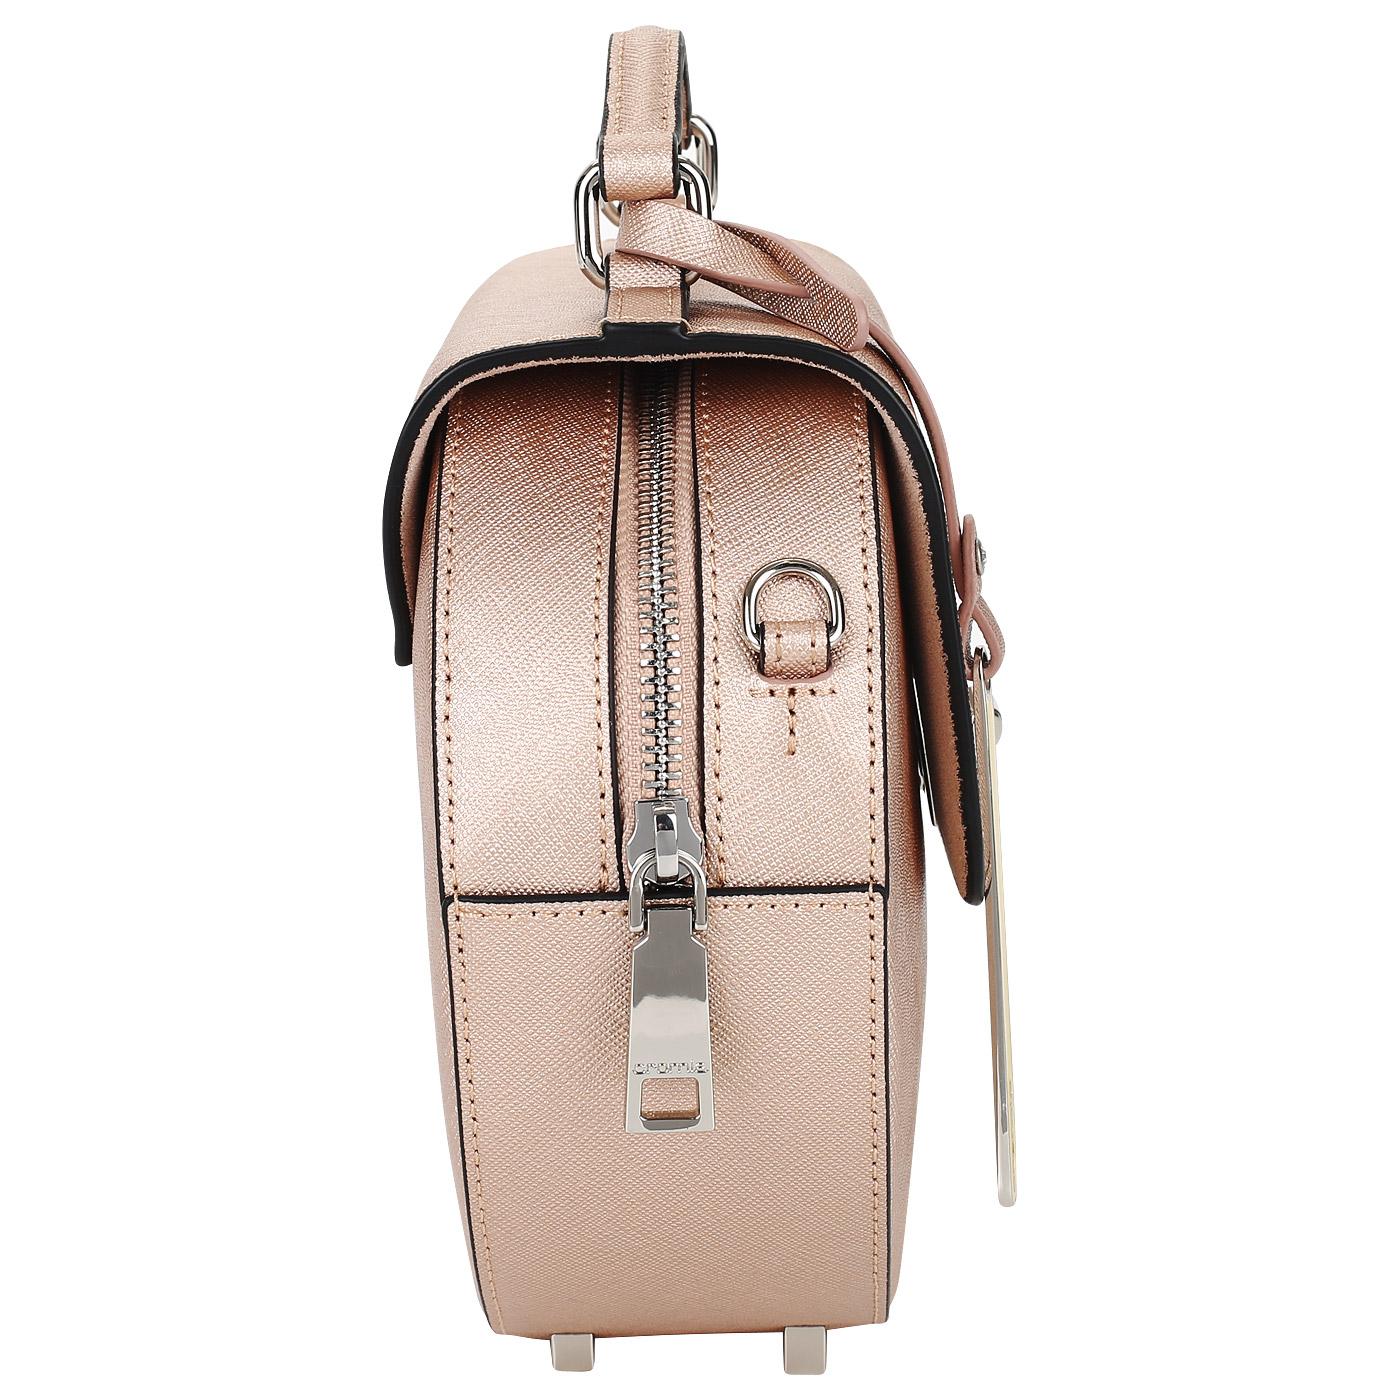 40437d51074f Круглая сумочка через плечо Cromia Perla 1403838_rame ...